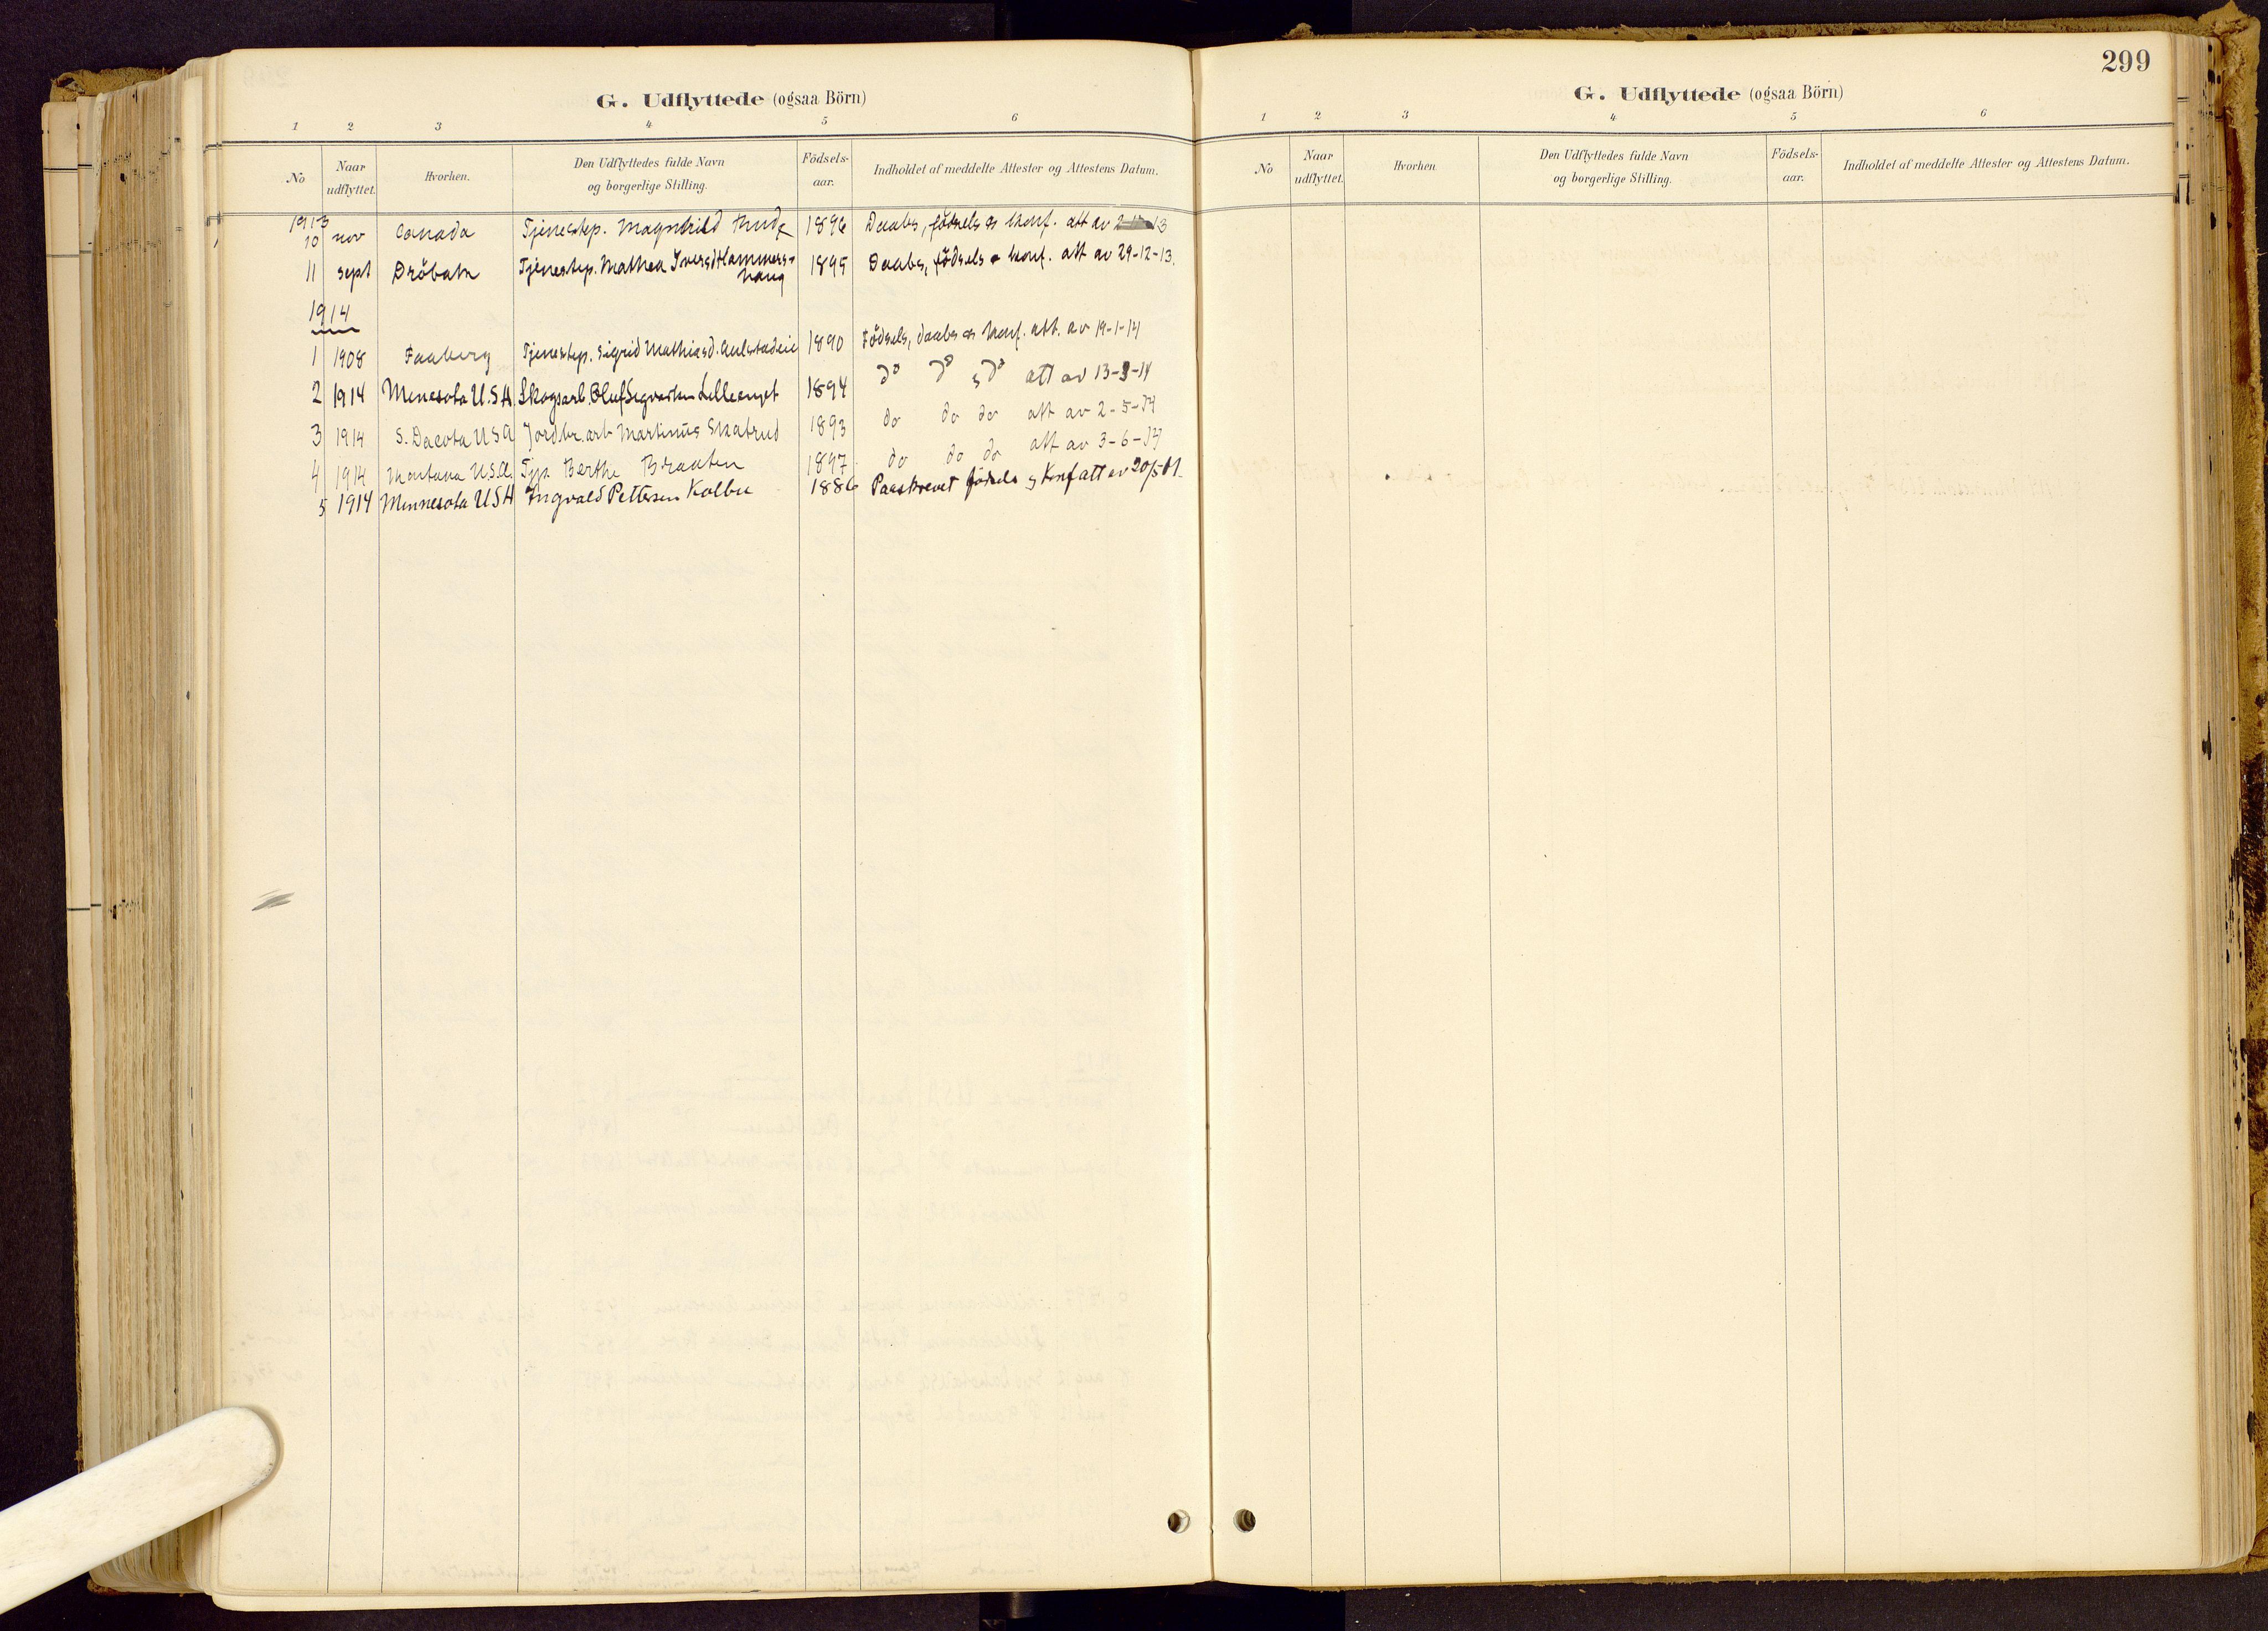 SAH, Vestre Gausdal prestekontor, Ministerialbok nr. 1, 1887-1914, s. 299